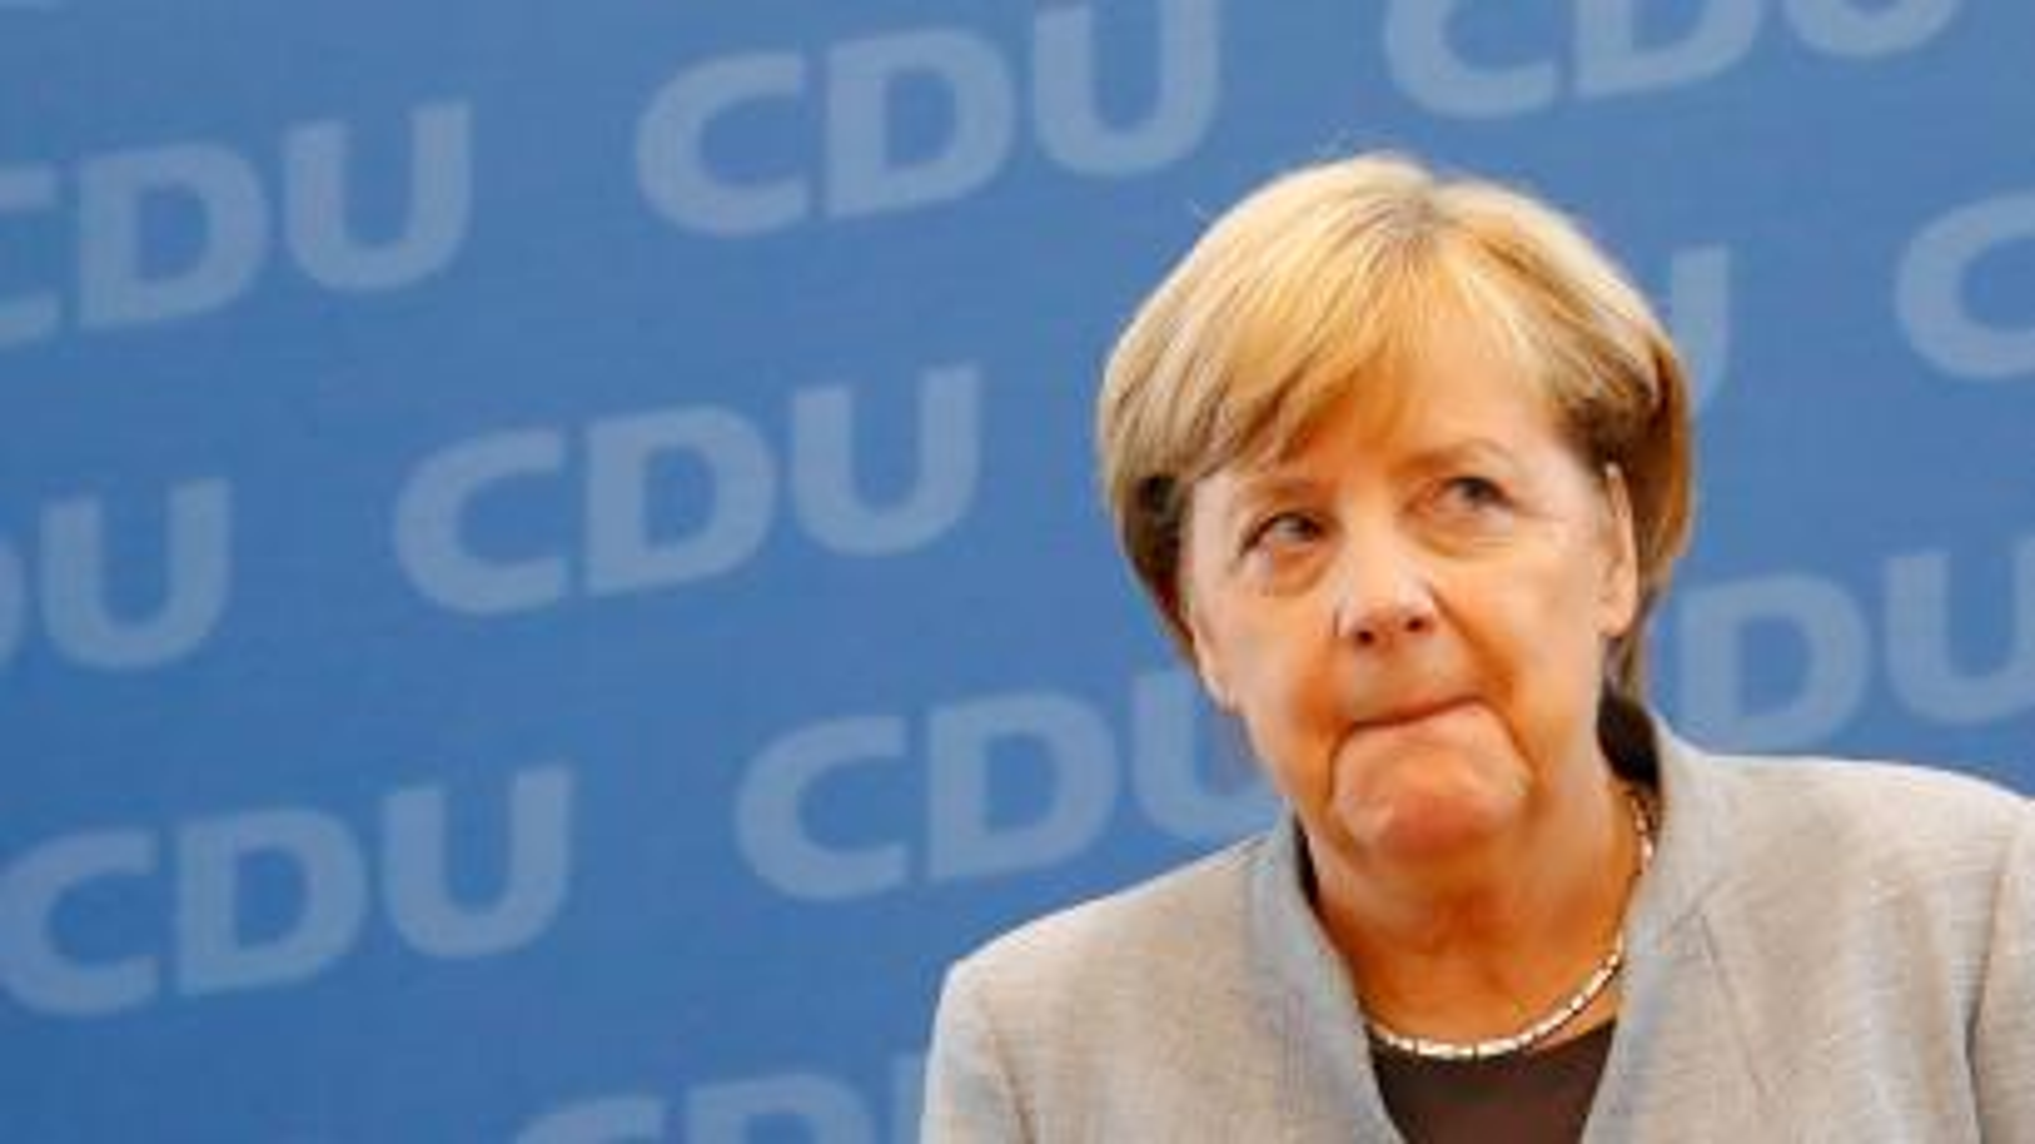 German Chancellor Angela Merkel after 2017 election